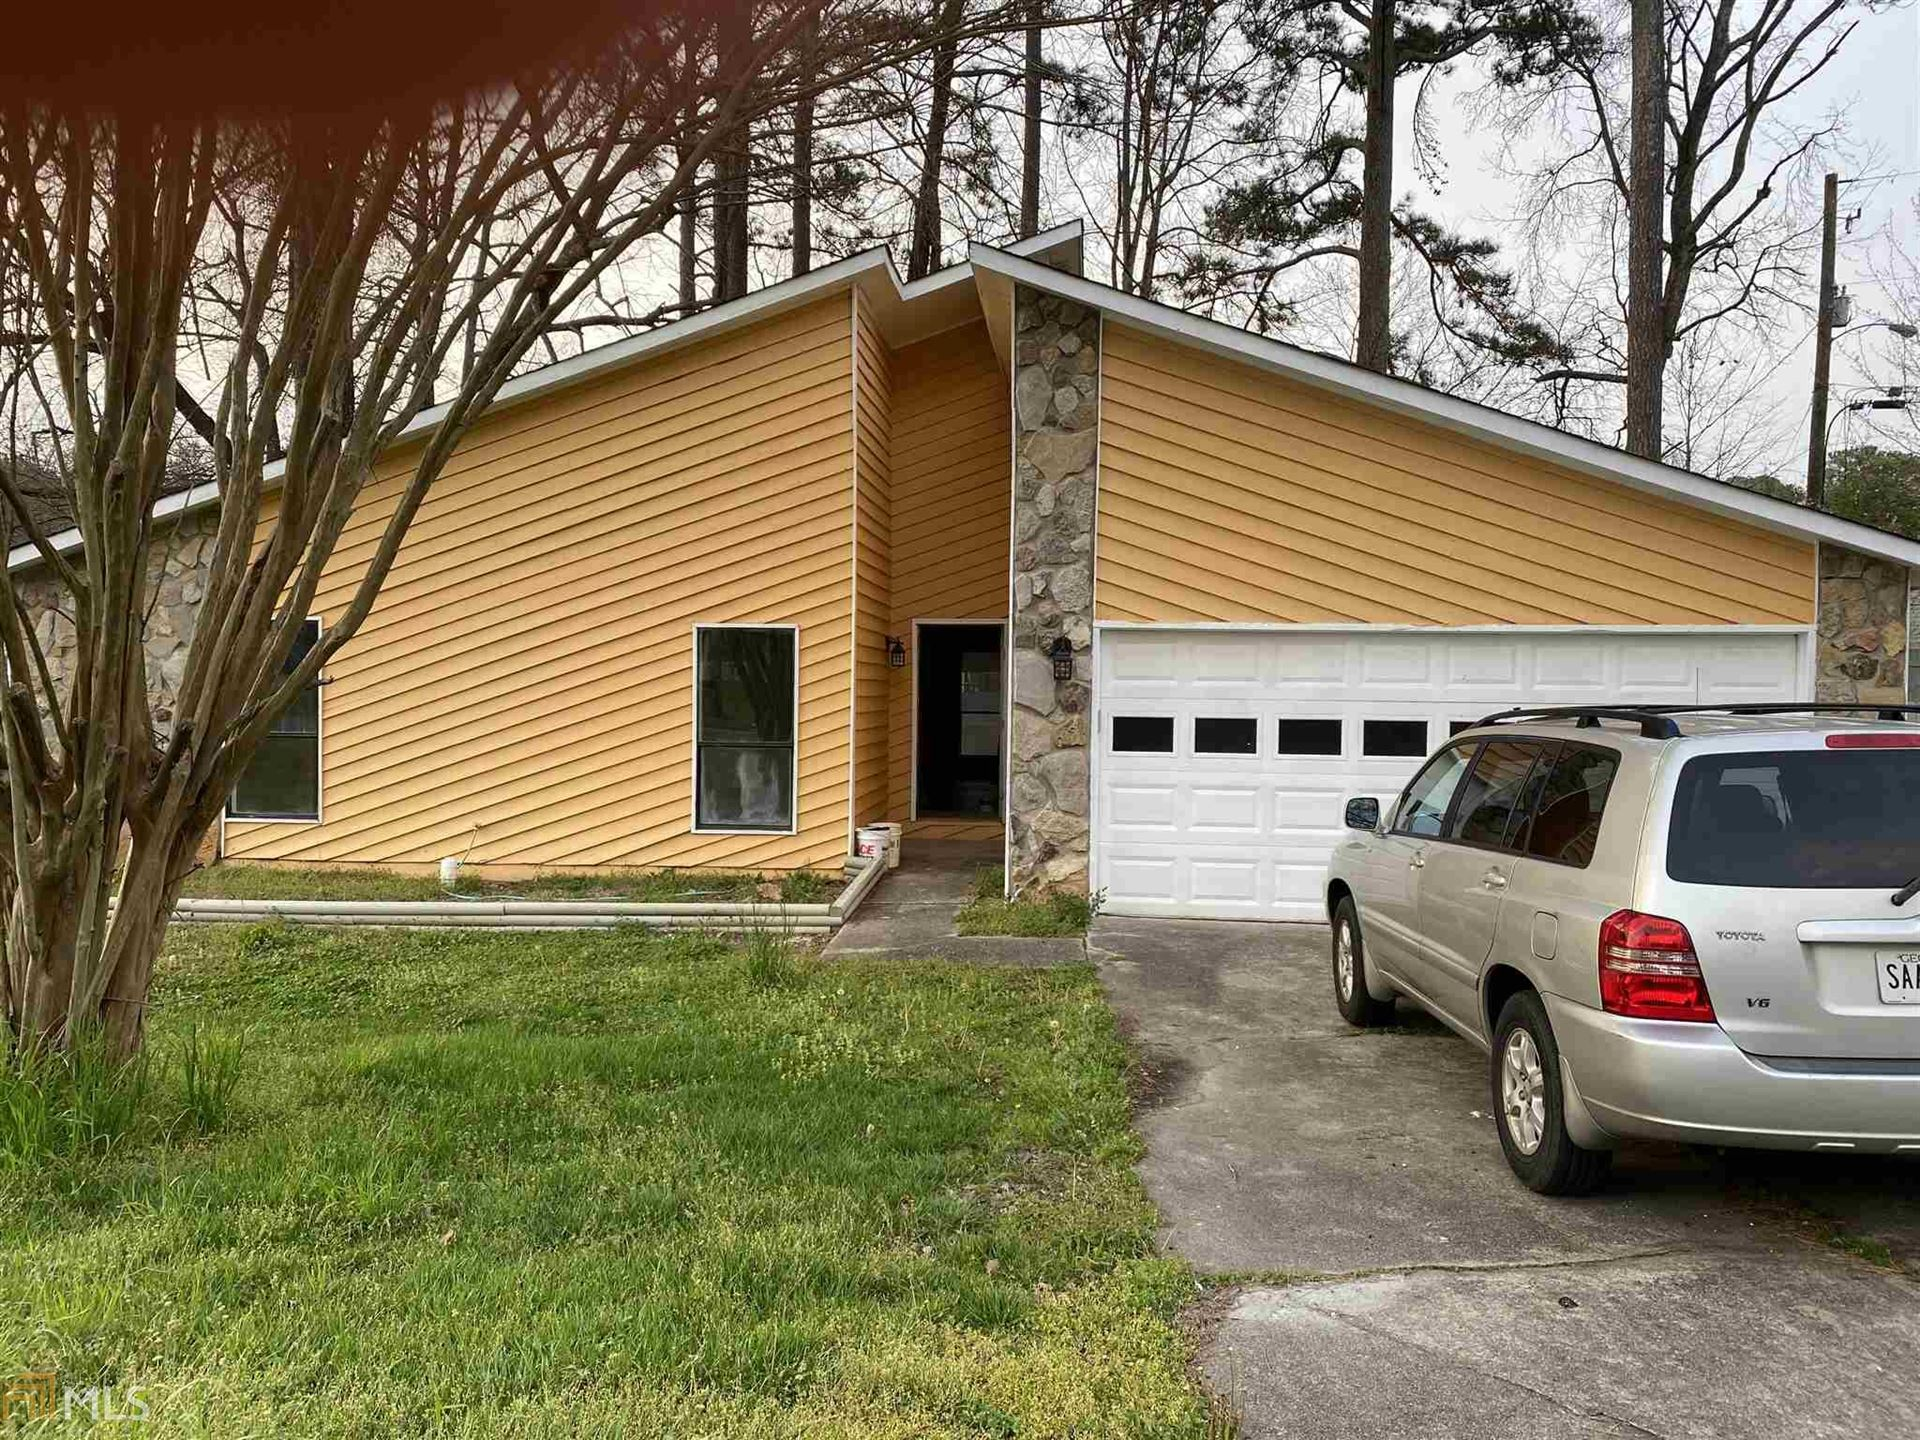 1490 Brays Mill Trce, Lawrenceville, GA 30044 - #: 8763414